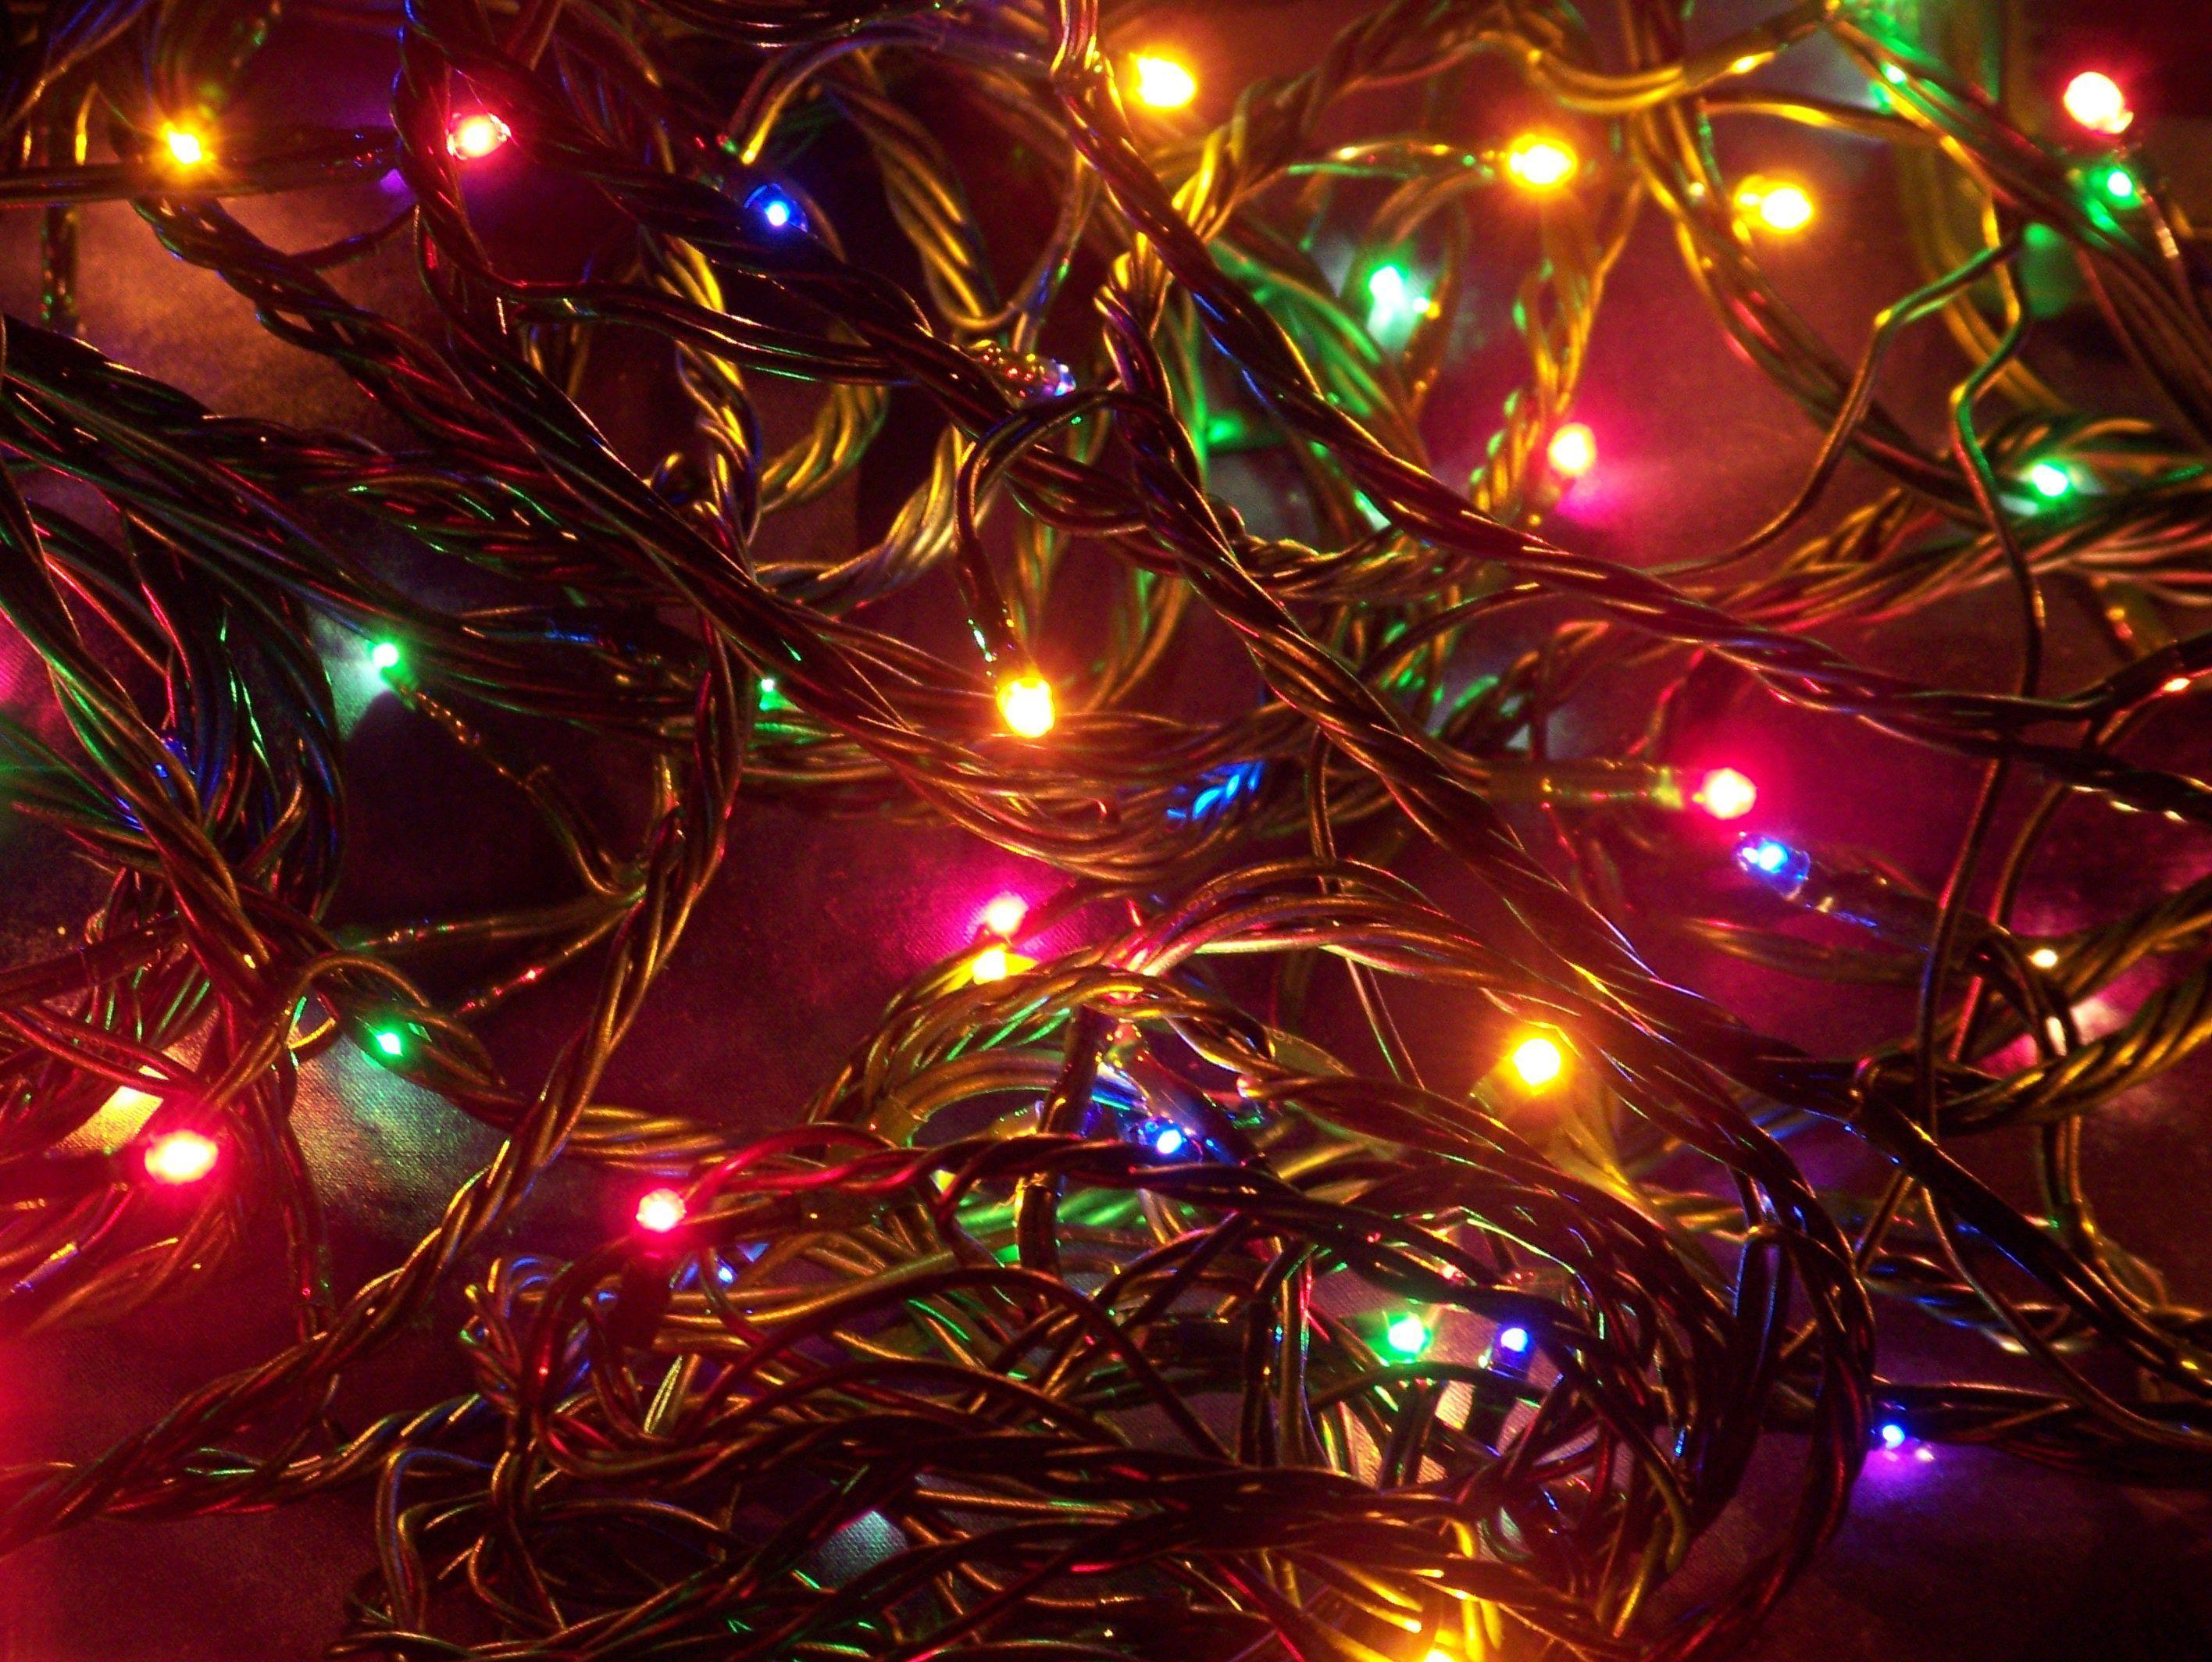 Popular Wallpaper Music Christmas - b1ce18356fc0cb1b440822f3cd115132  Pictures_65117.jpg